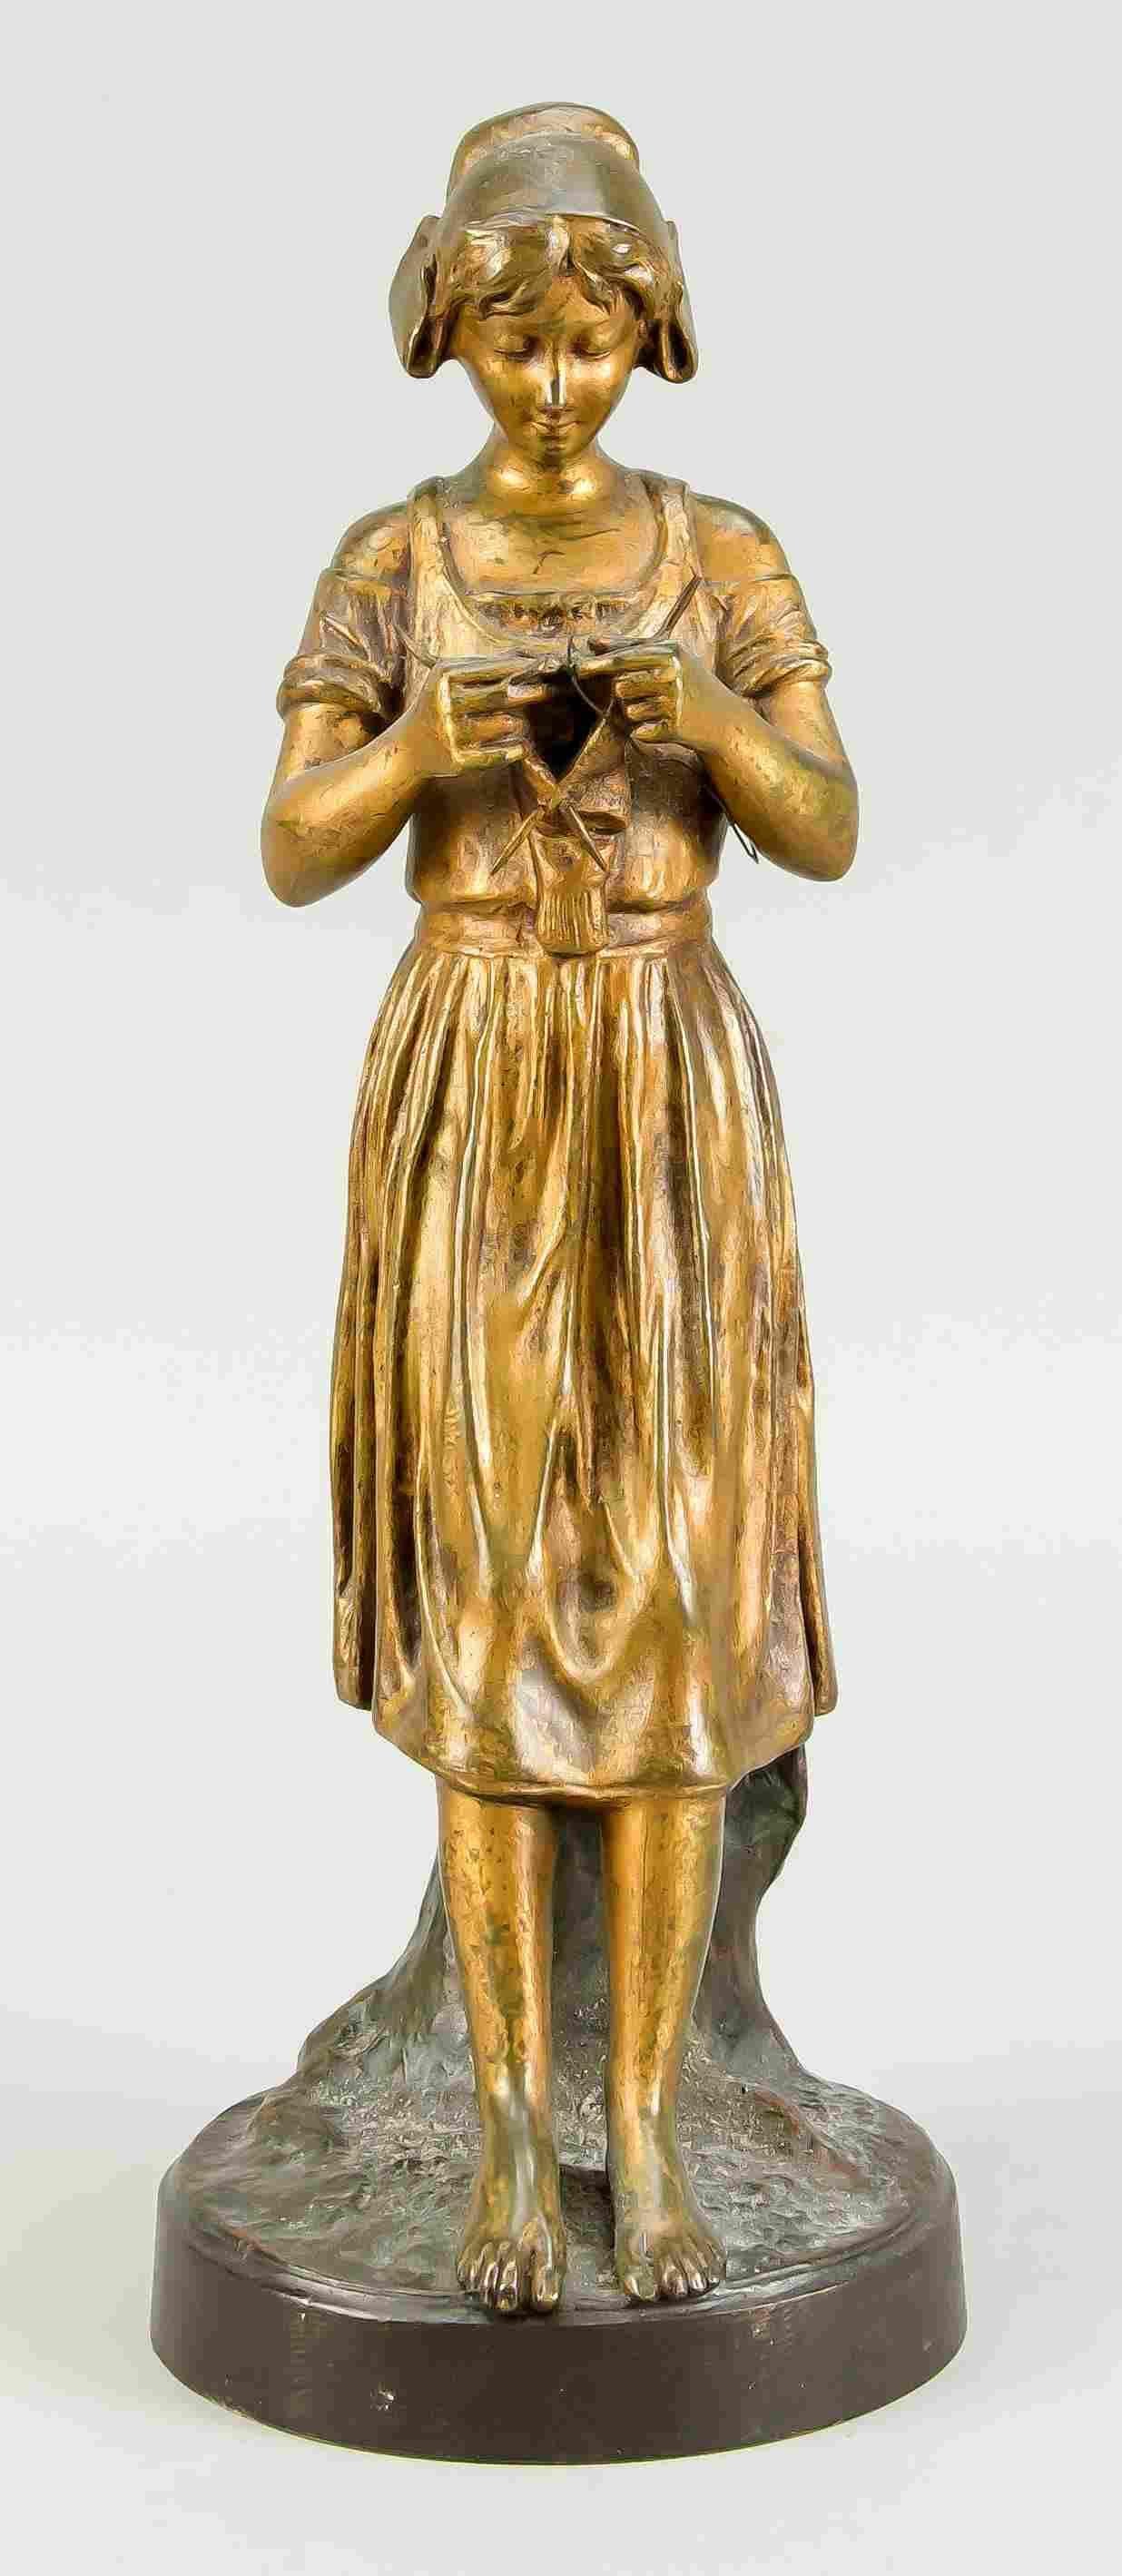 Joseph Berthoz (XIX), French sculpt